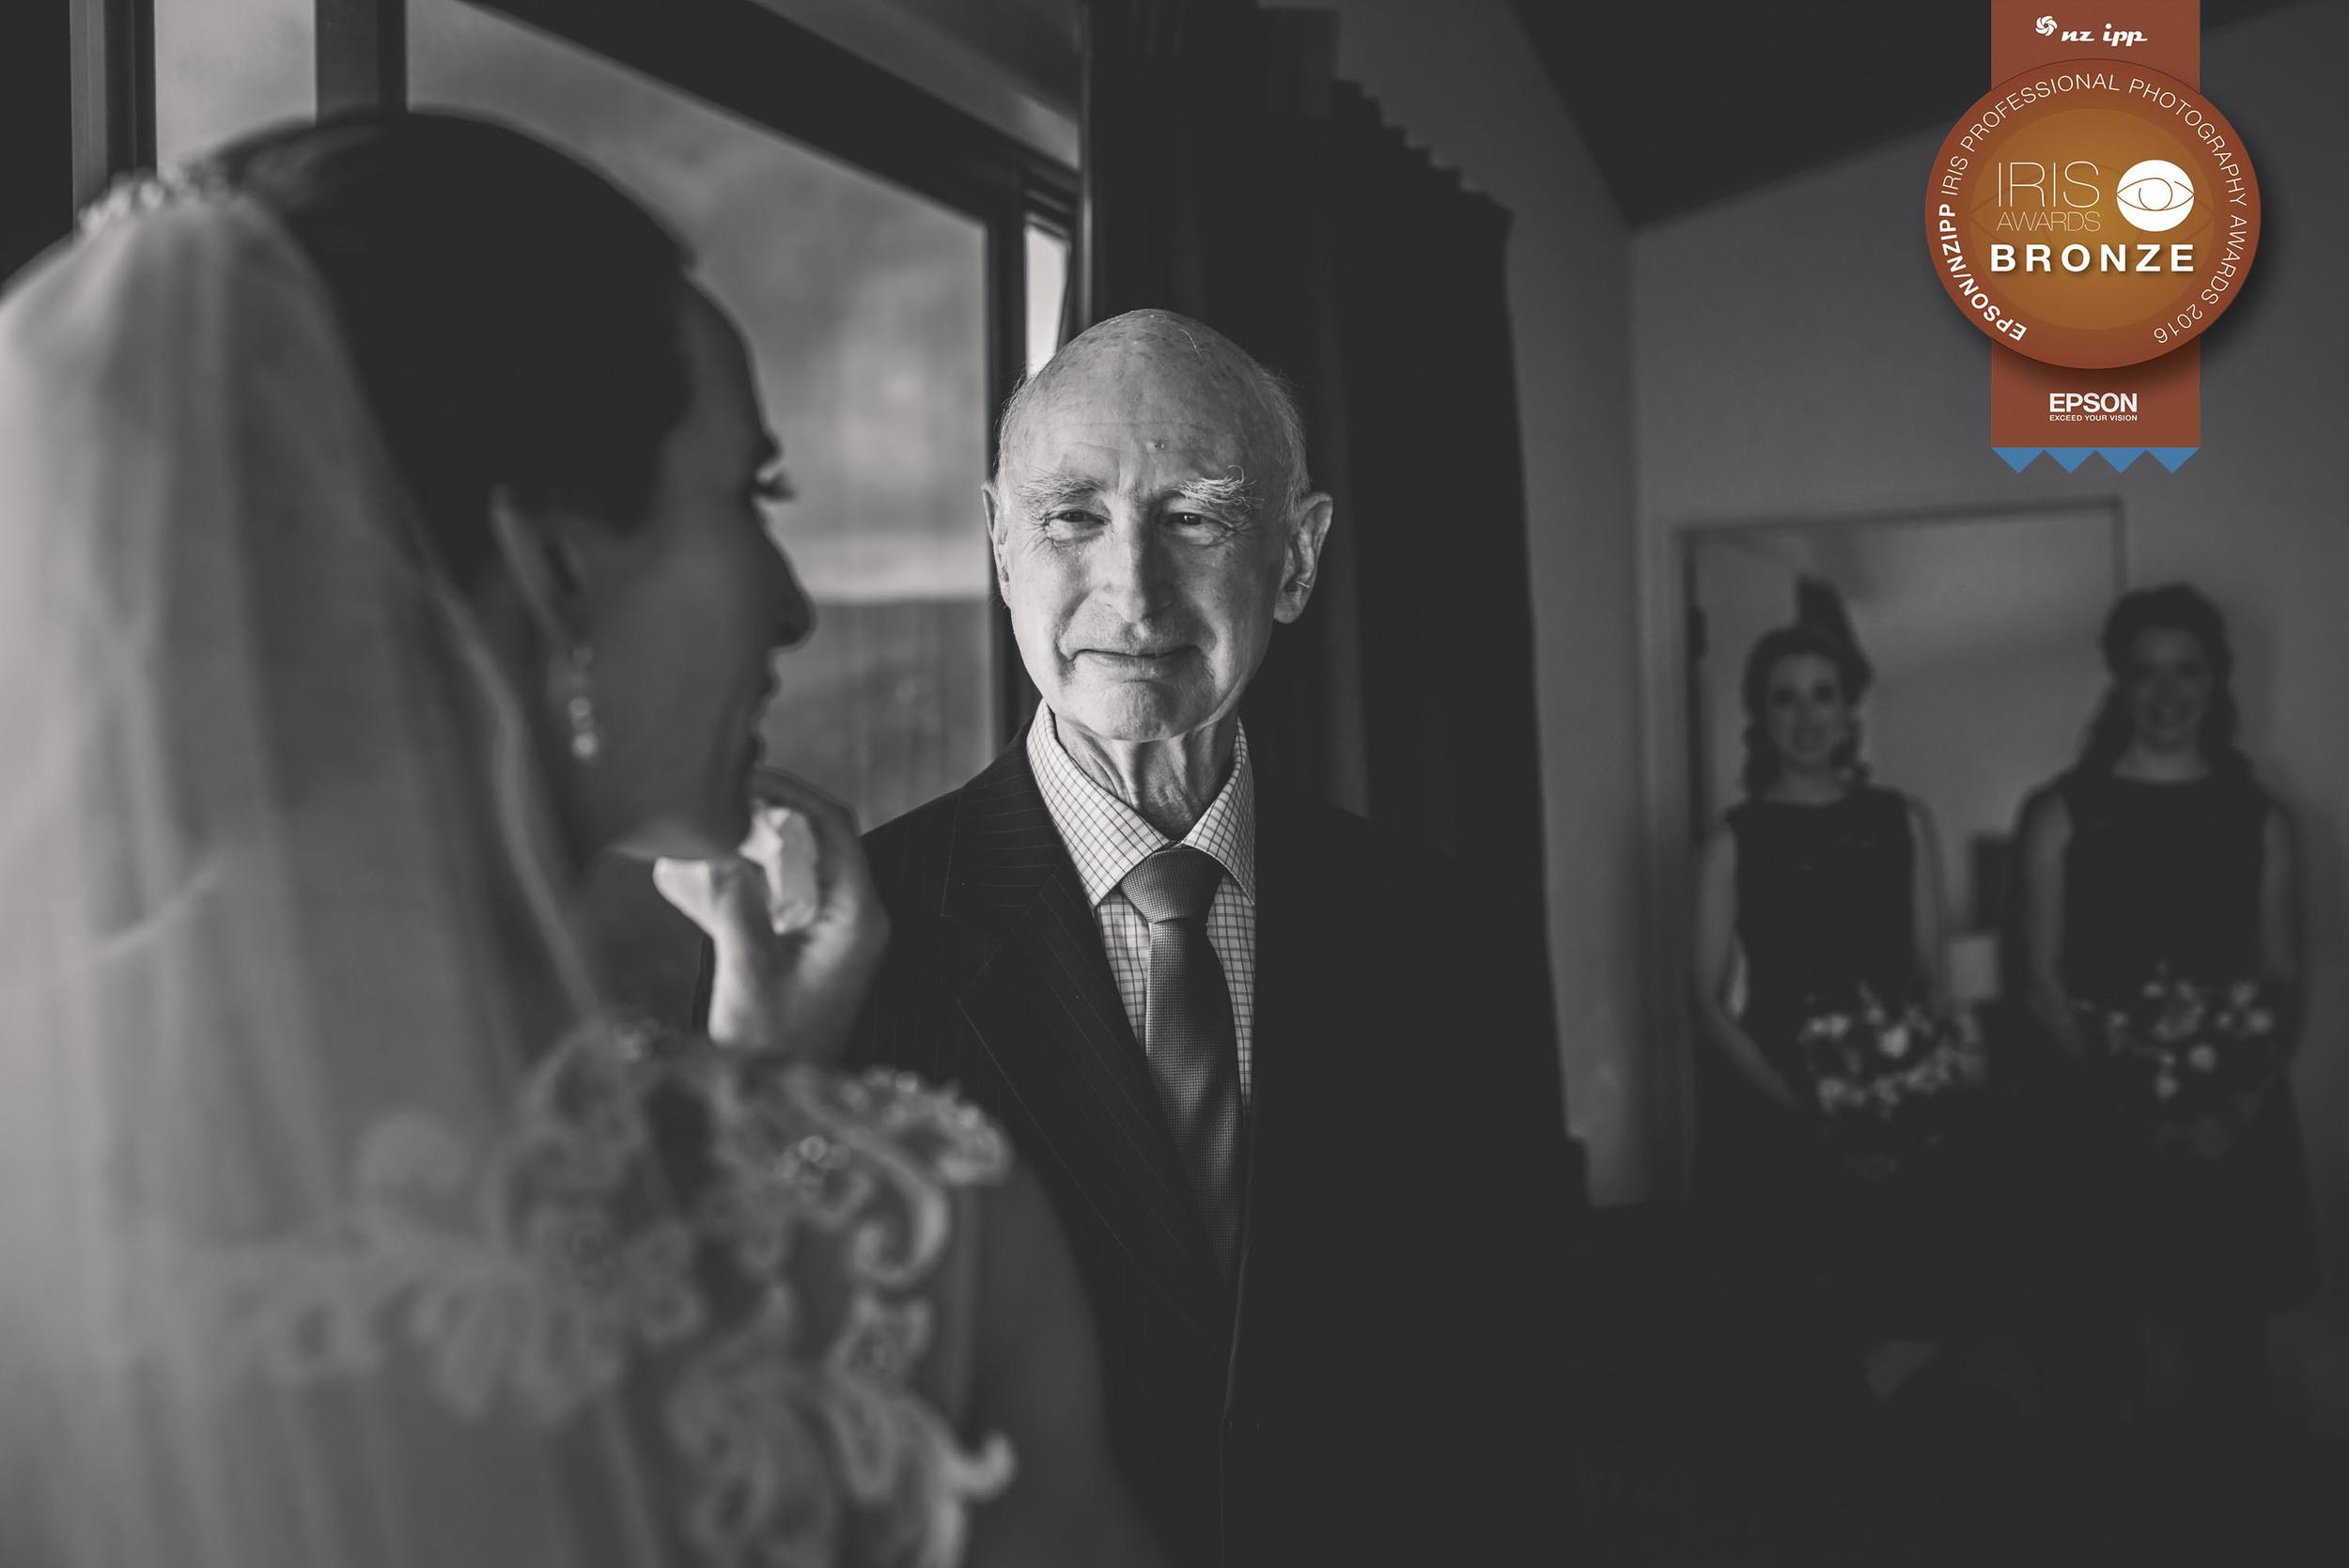 Award winning wedding photographer New Zealand - Iris Awards